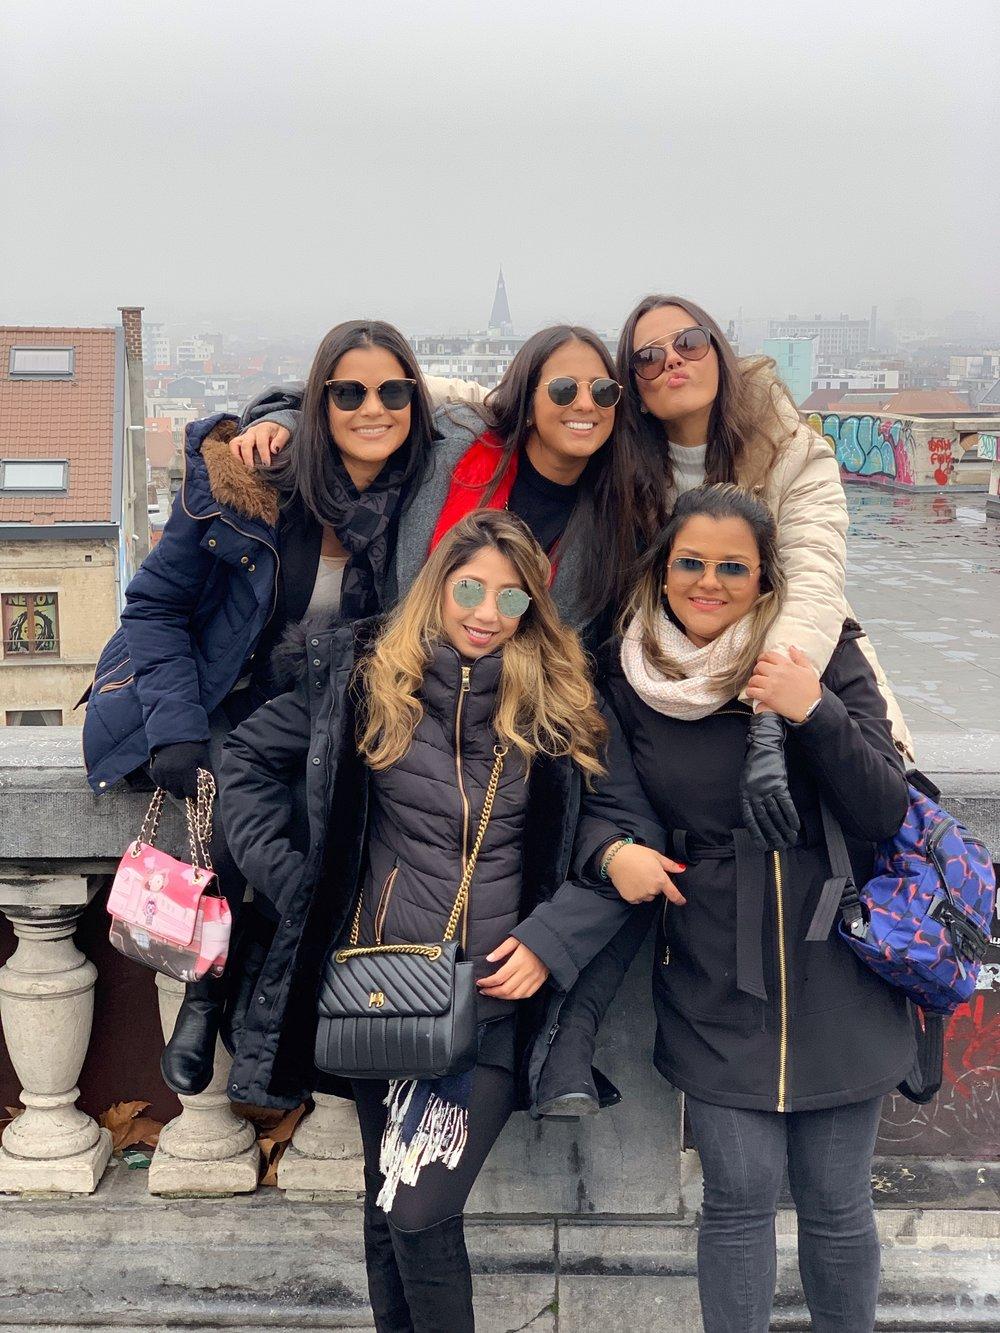 fashion travel blogger ideas xmas much needed paloma de la cruz inspiración fluir  friends europe